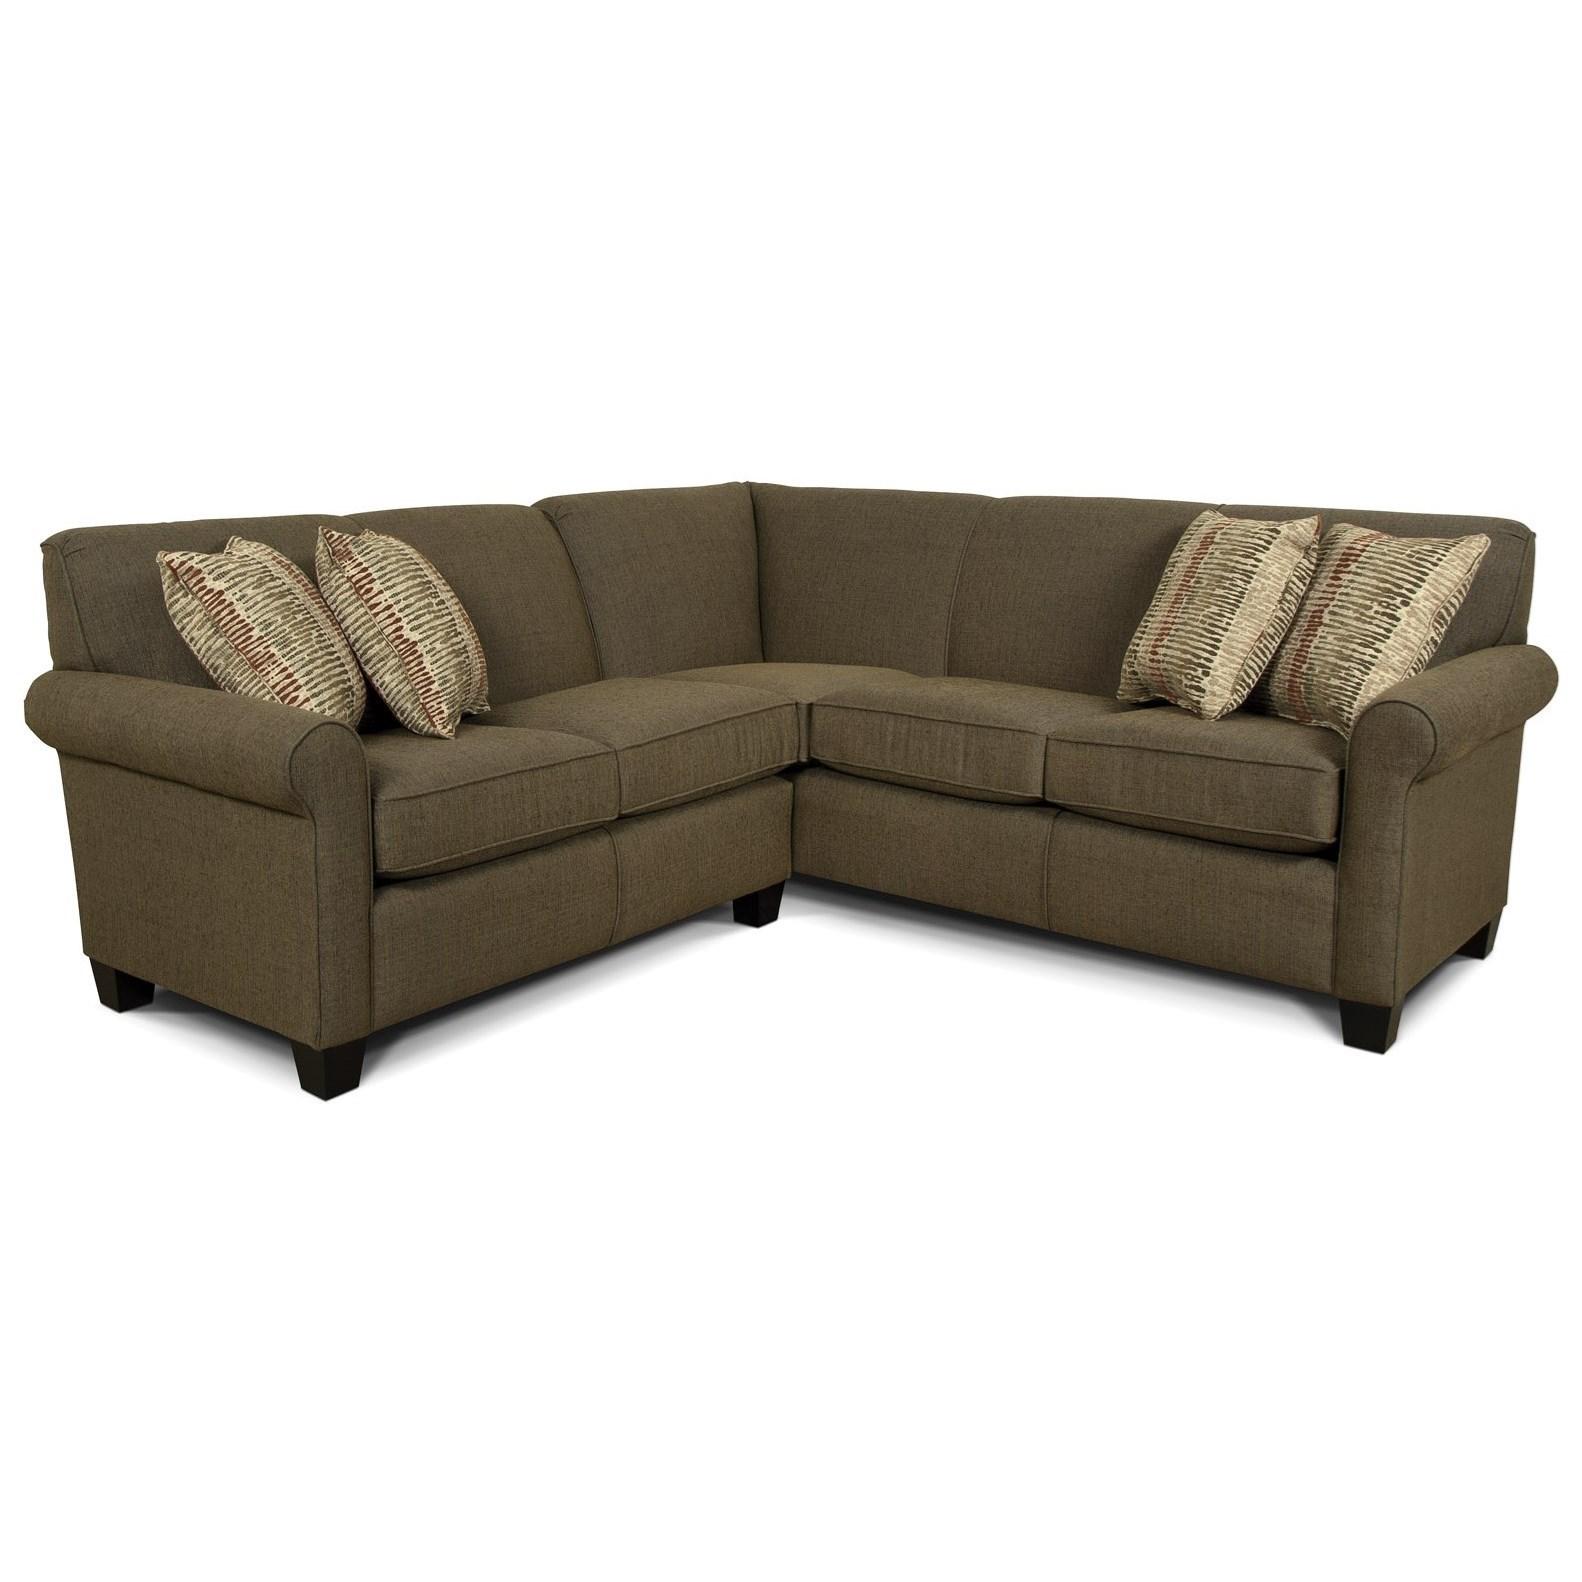 england angie small corner sectional sofa dunk bright furniture rh dunkandbright com